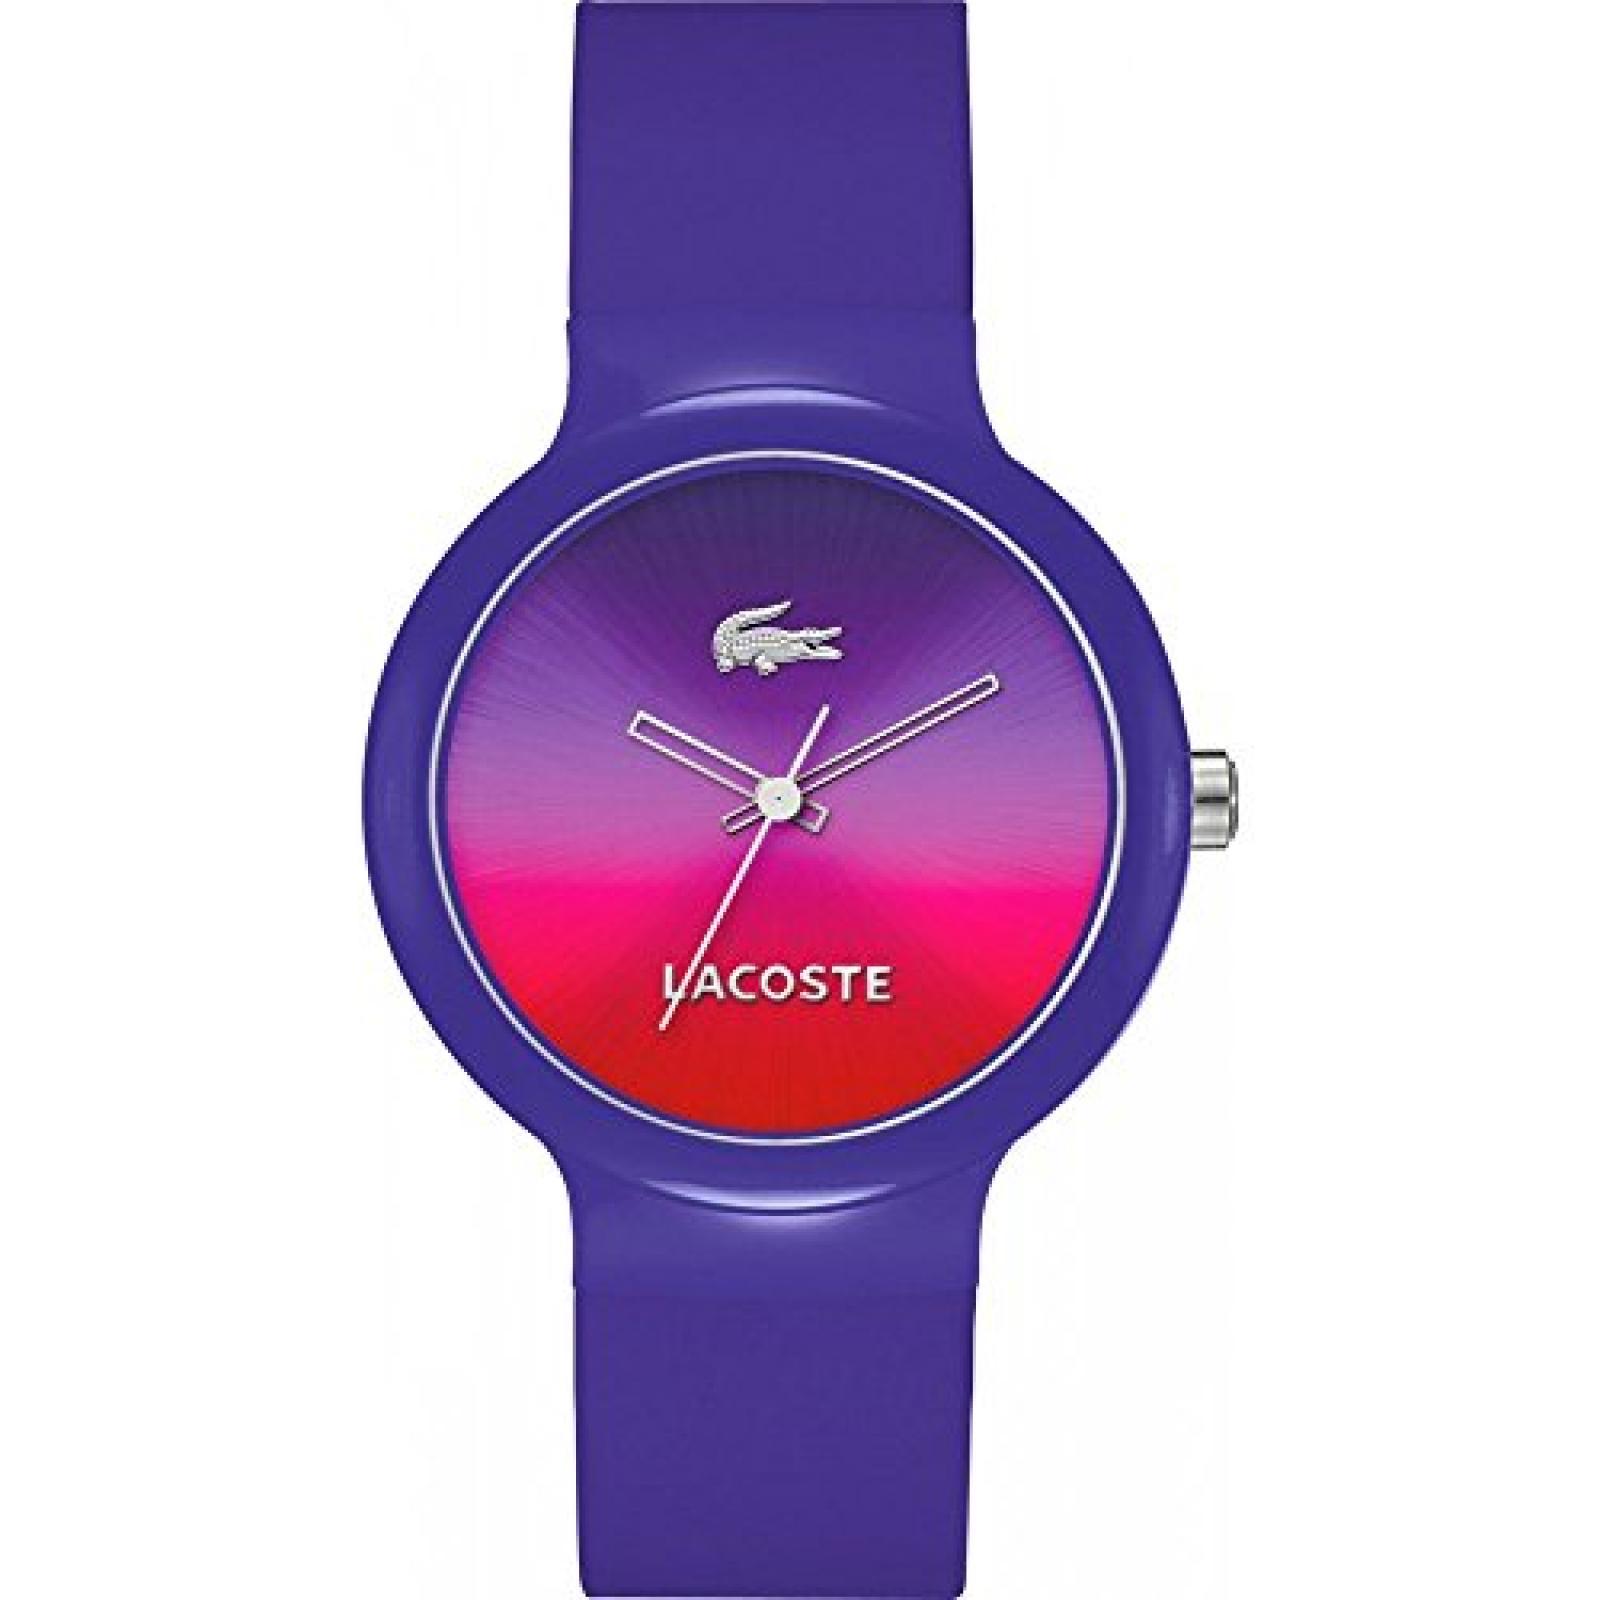 Lacoste Damen-Armbanduhr GOA Analog Quarz Silikon lila 2020079